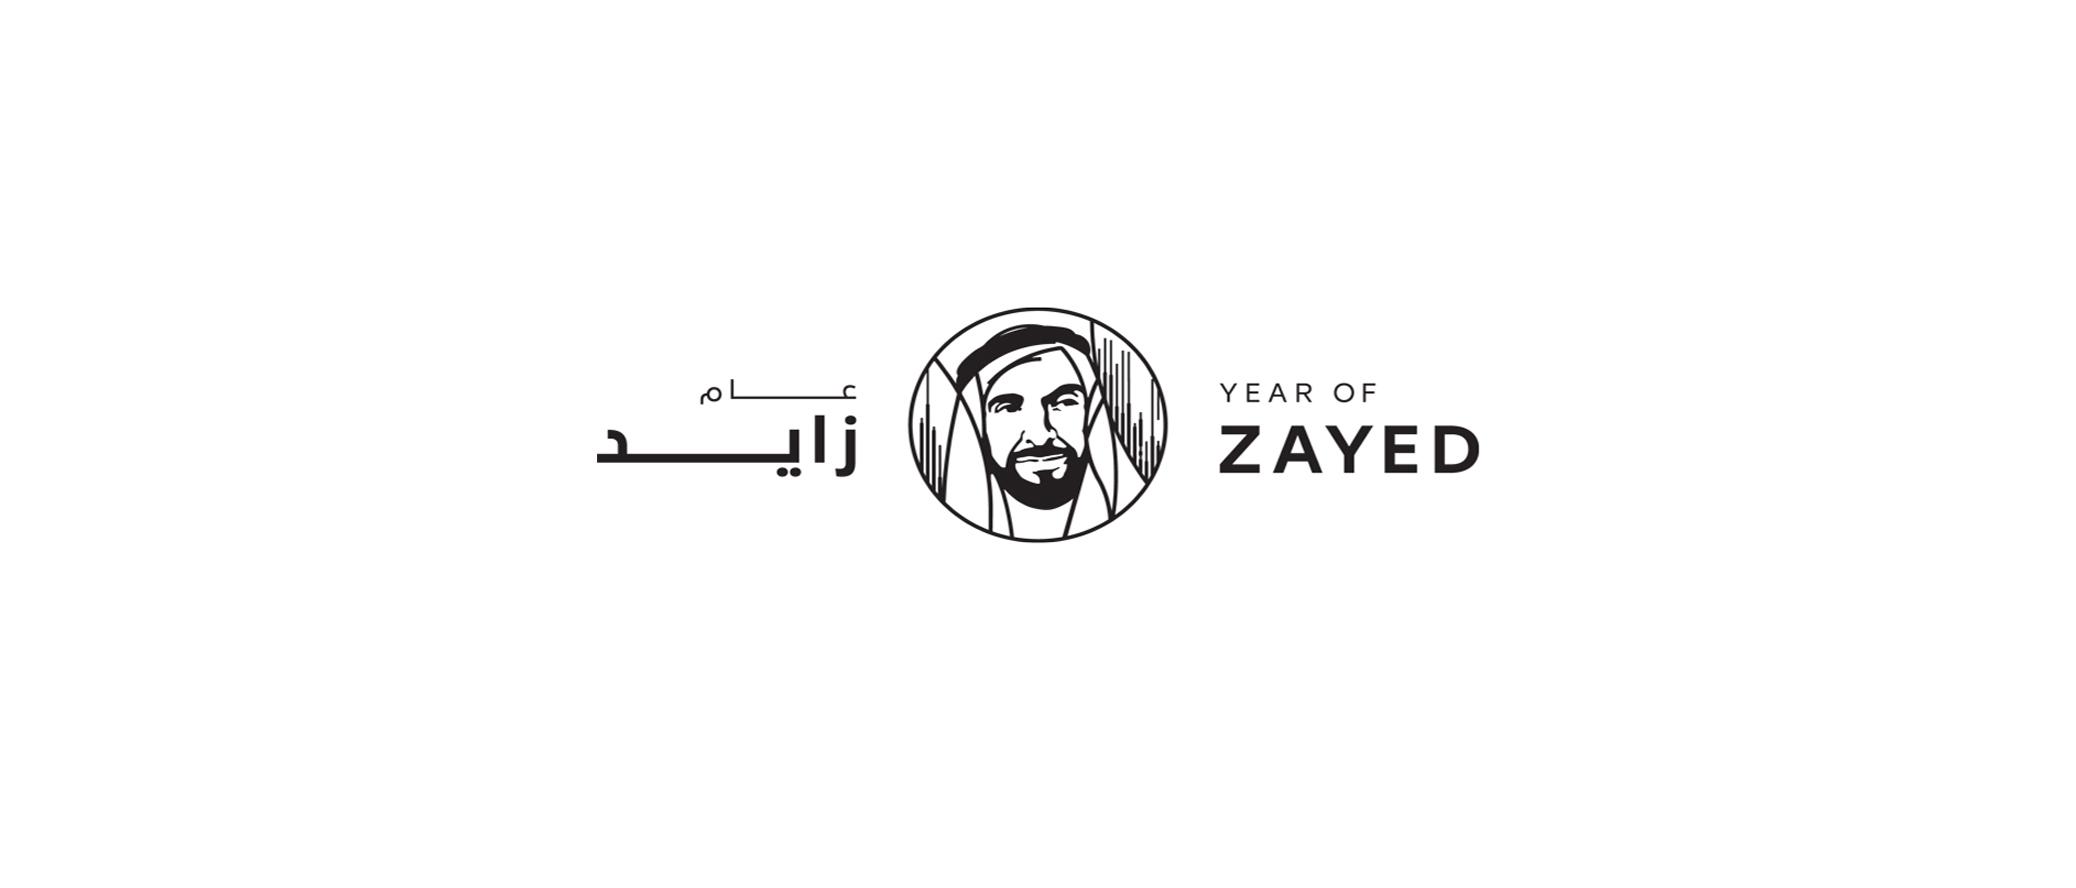 Zayed year banner